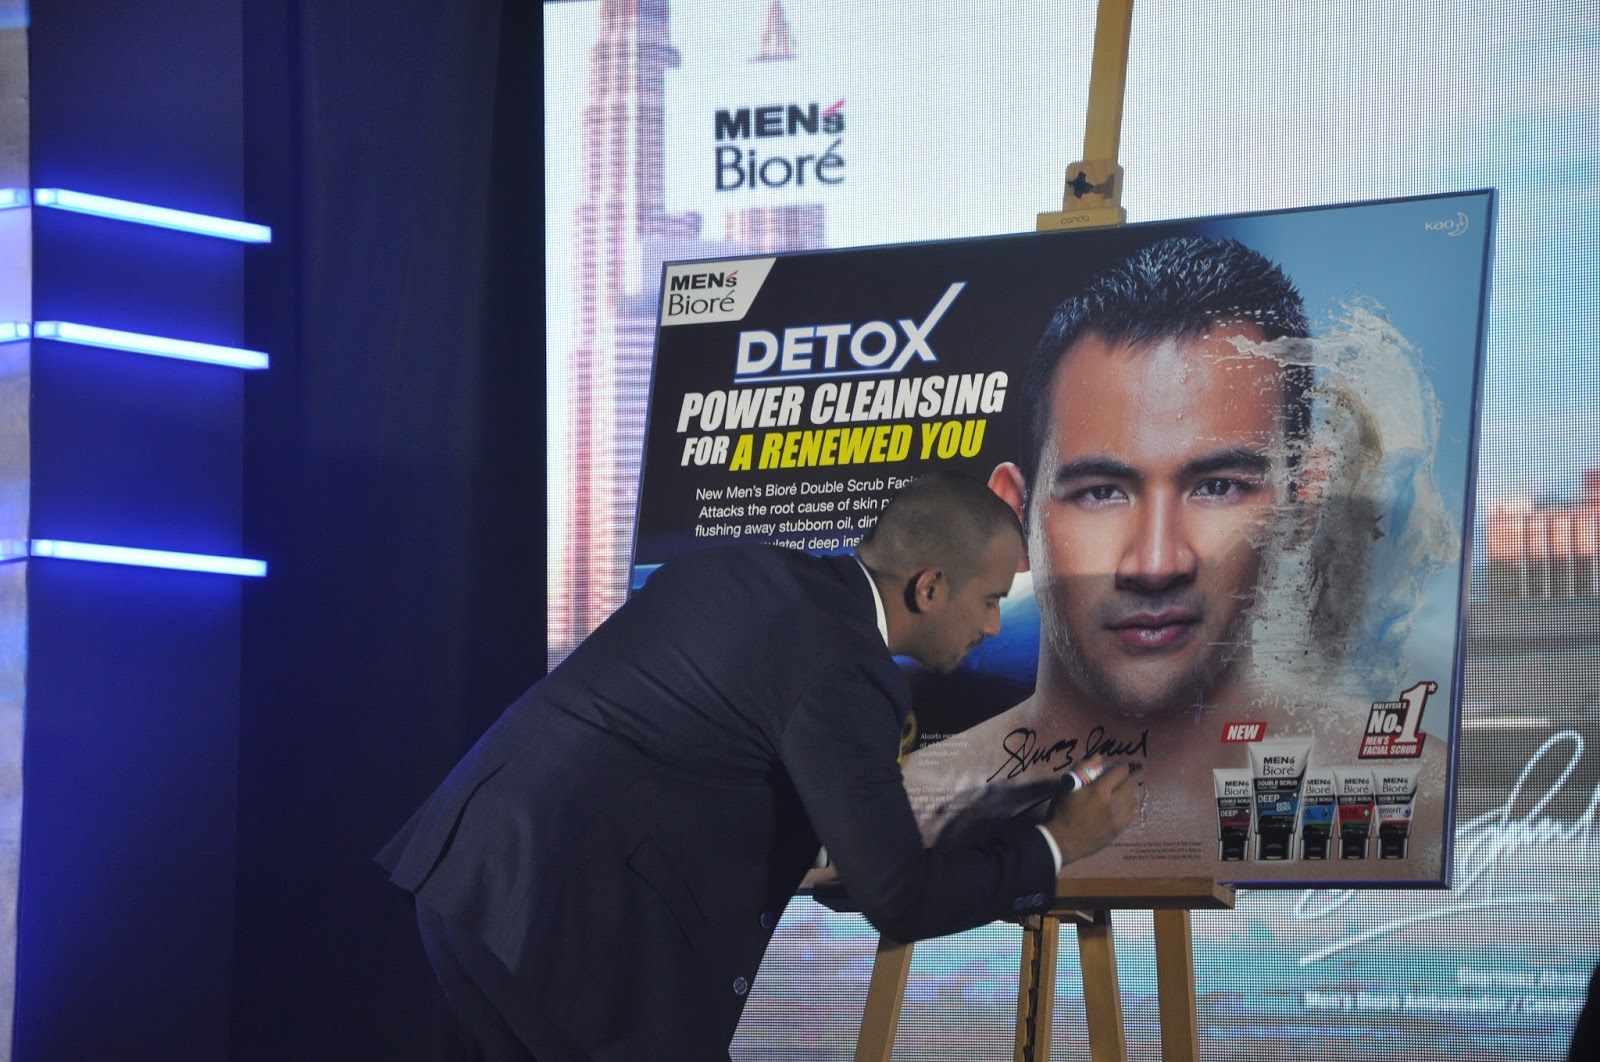 Sara Wanderlust Launch The New Mens Bior Double Scrub Range Kao Biore Facial Foam Men S Cool Oil Clear 100g Sharnaaz Ahmad Signing Poster At